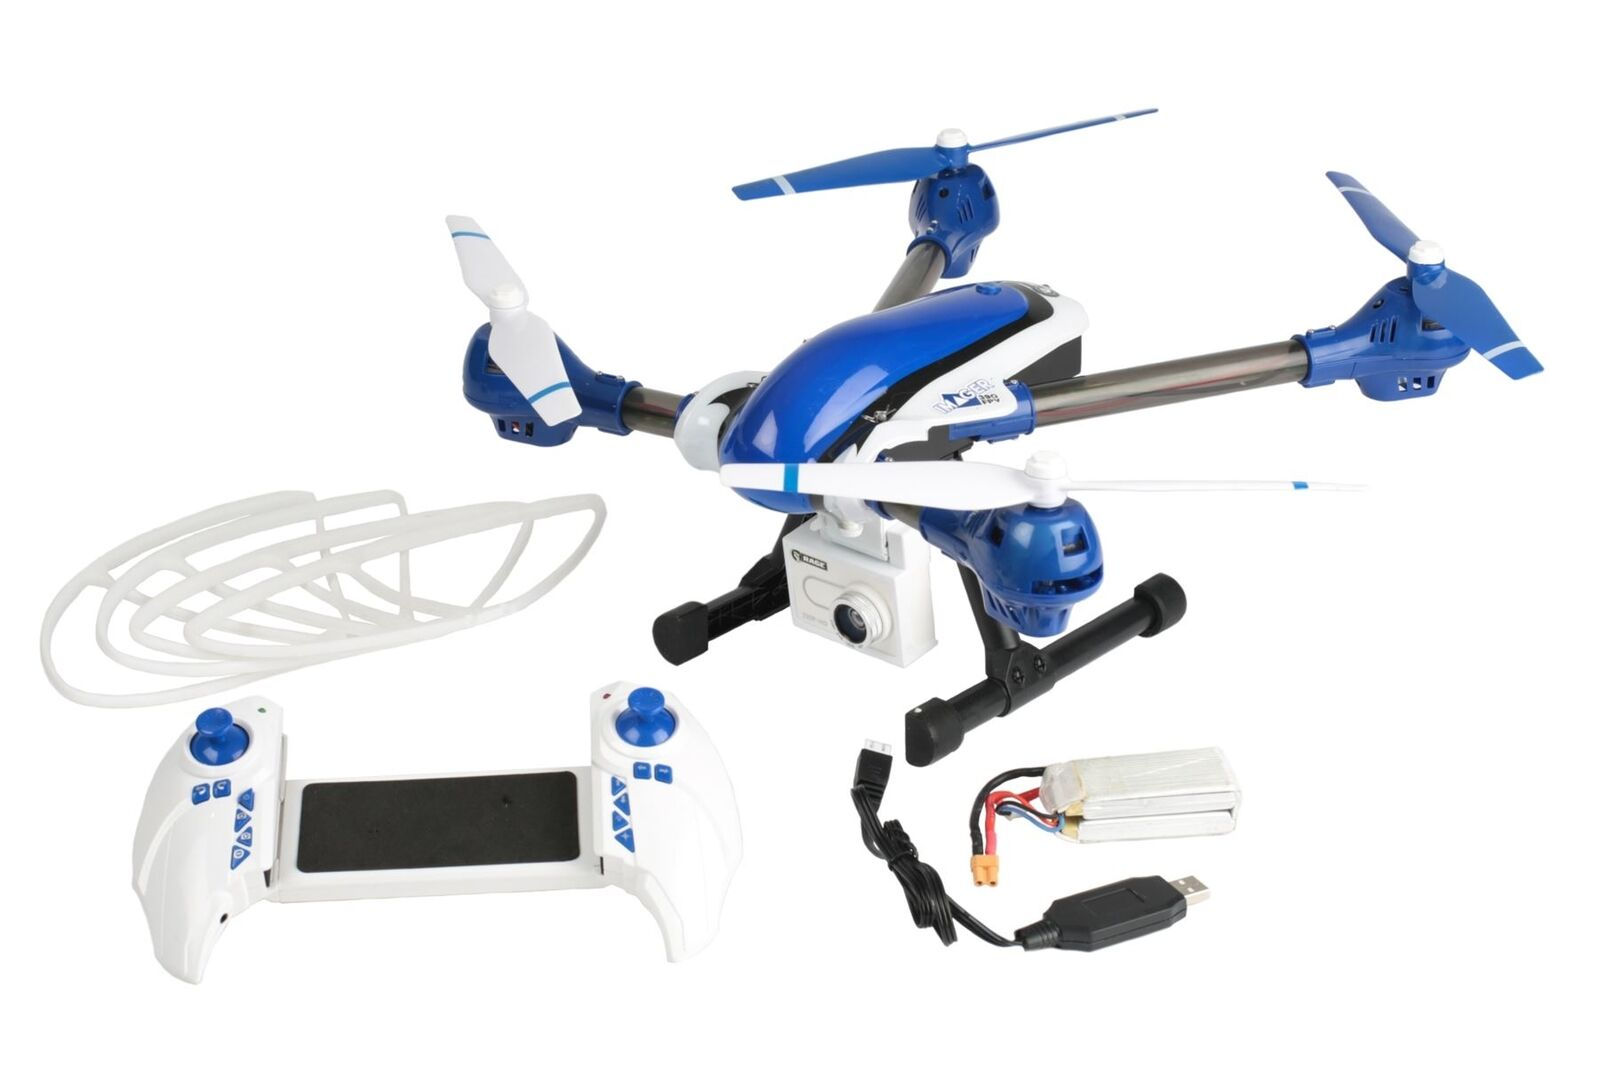 Rage R C-Toner FPV RTF Drone 390